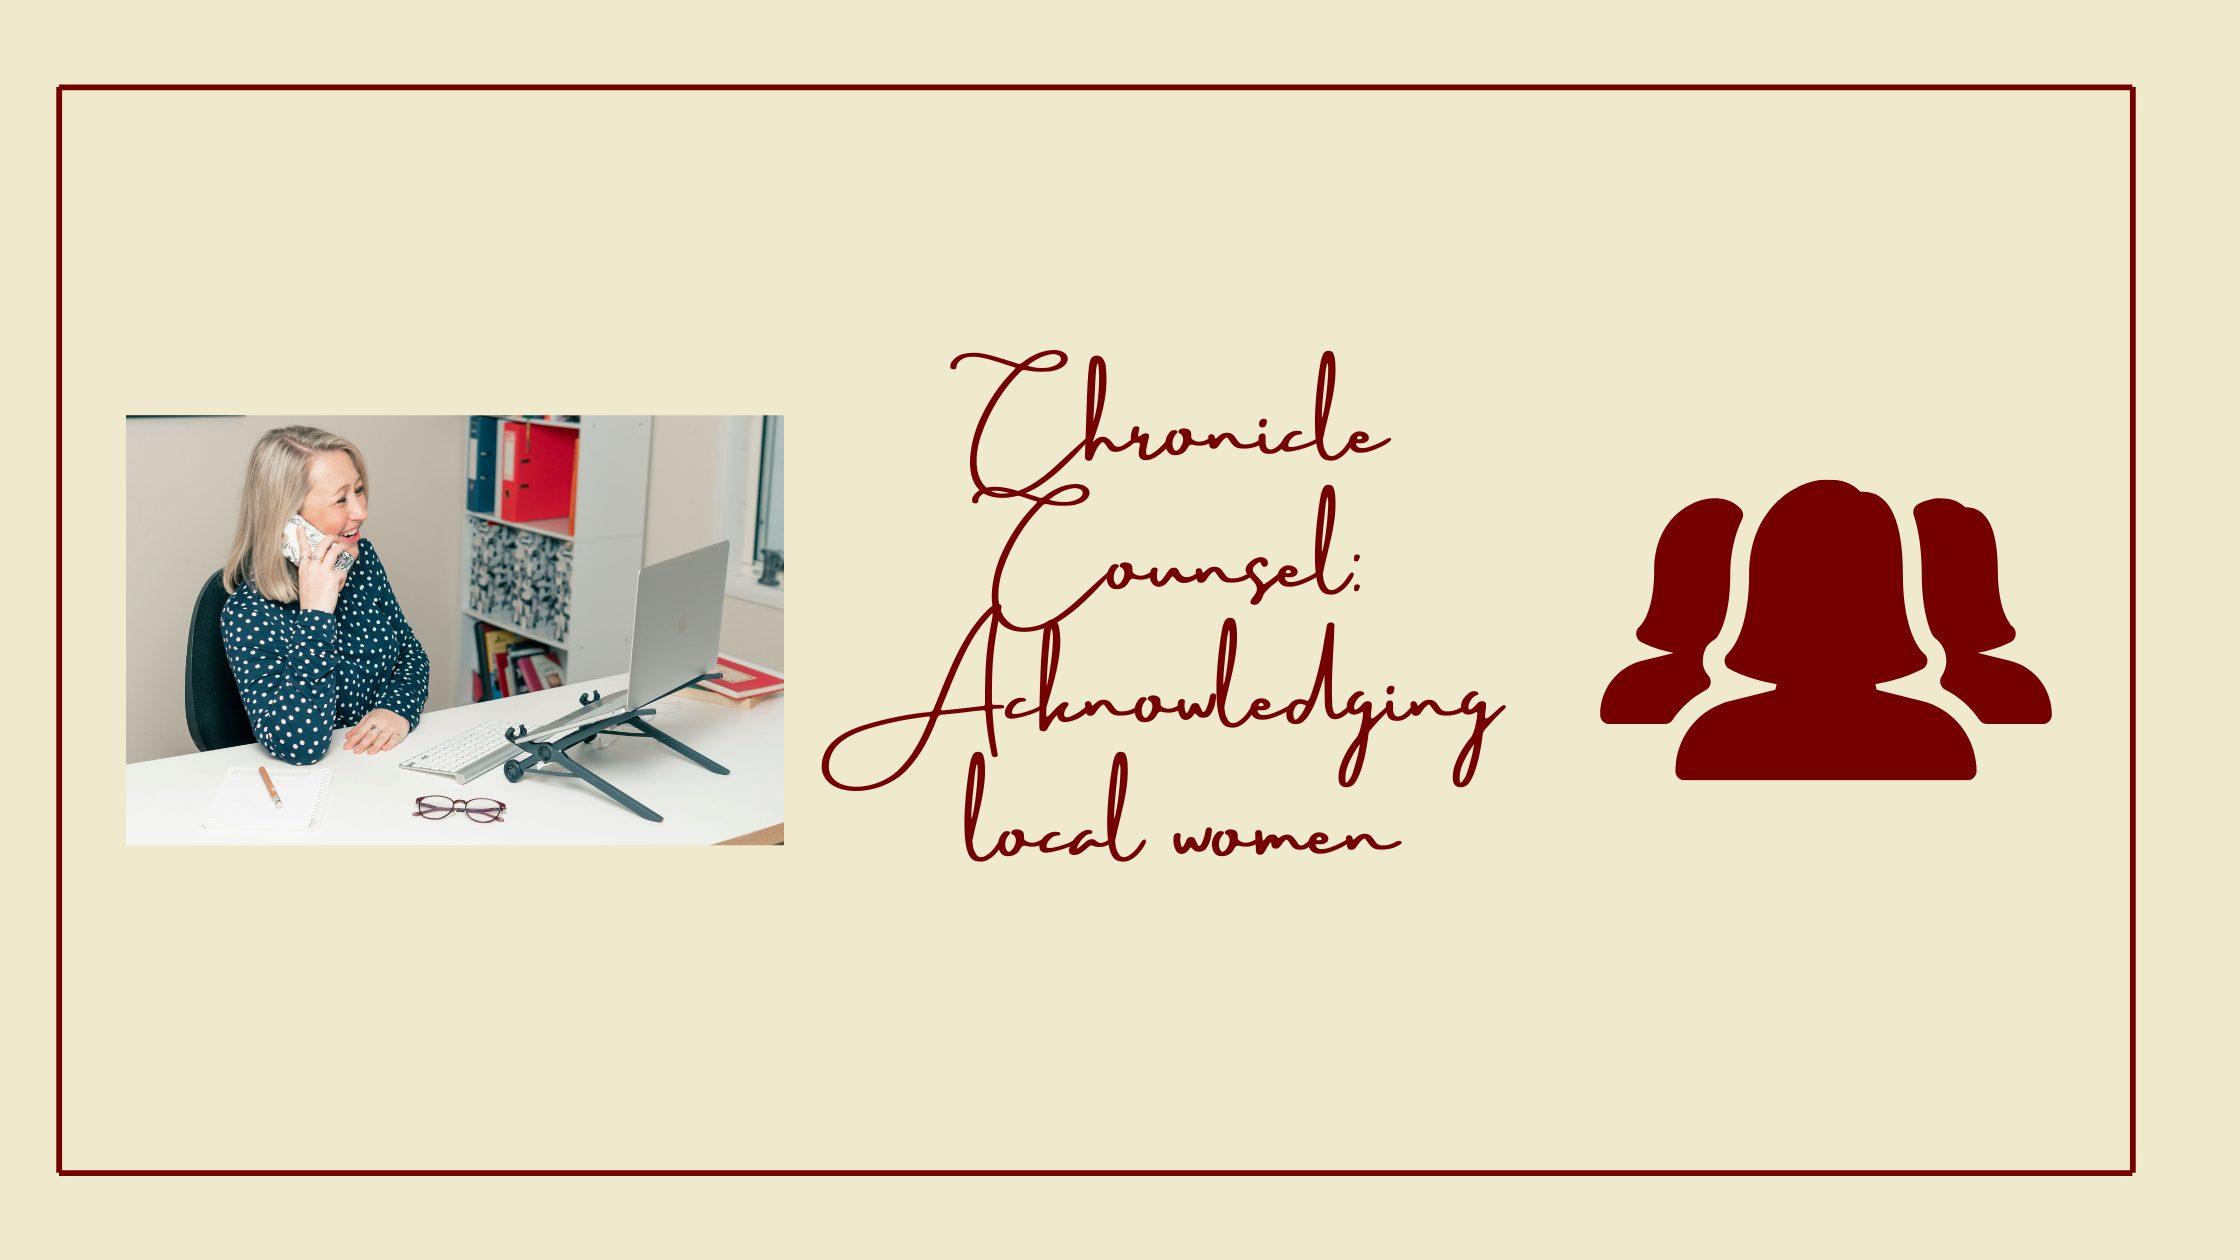 Acknowledging local women